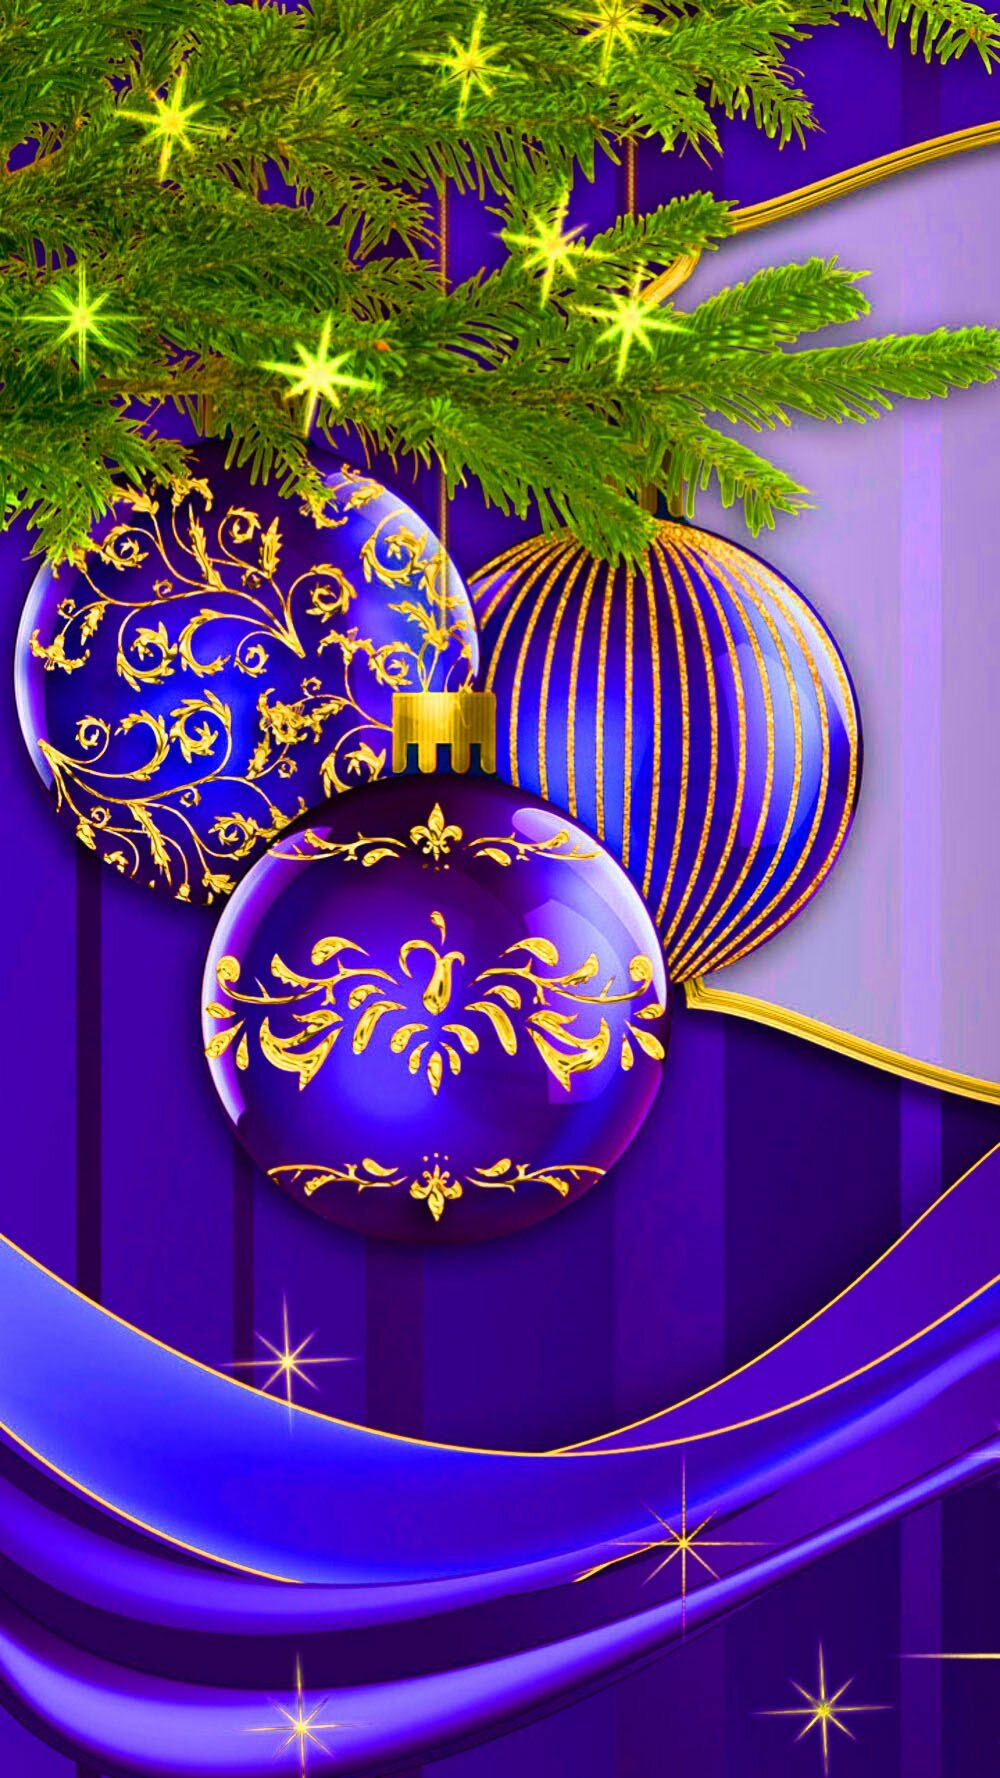 Картинка обои на телефон новогодние